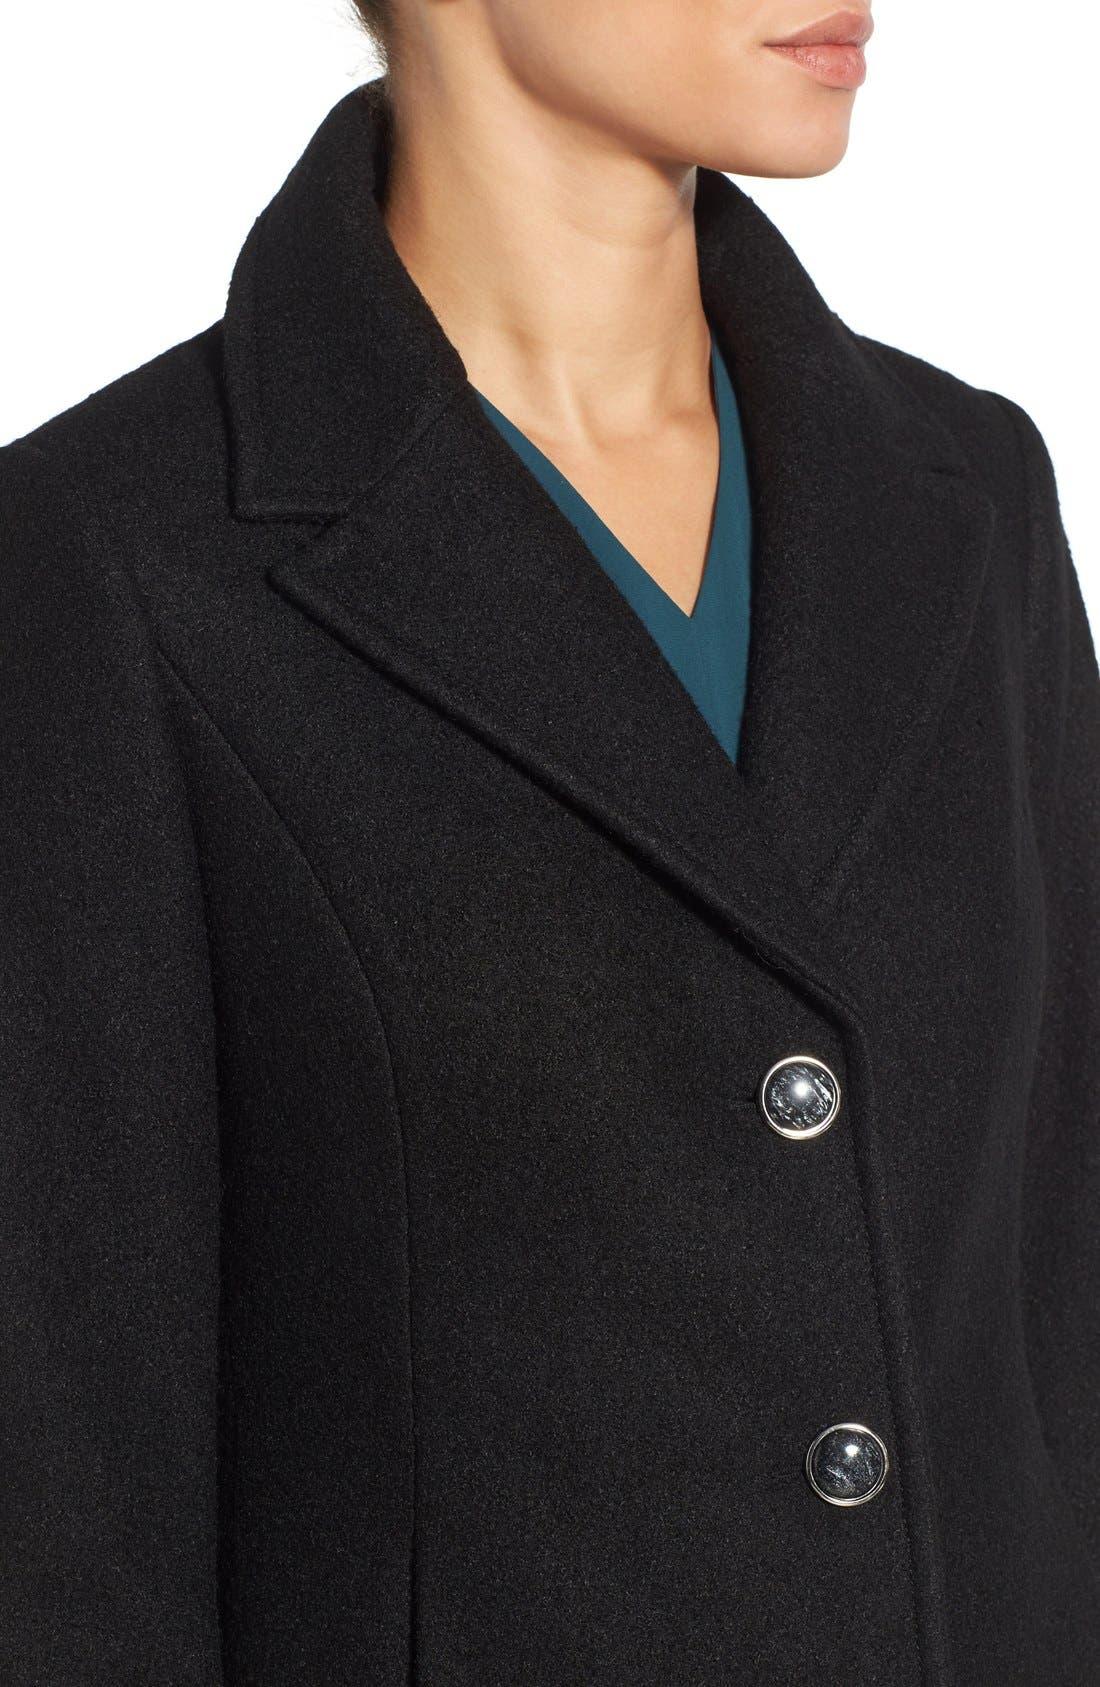 Notch Lapel Peplum Coat,                             Alternate thumbnail 4, color,                             Black